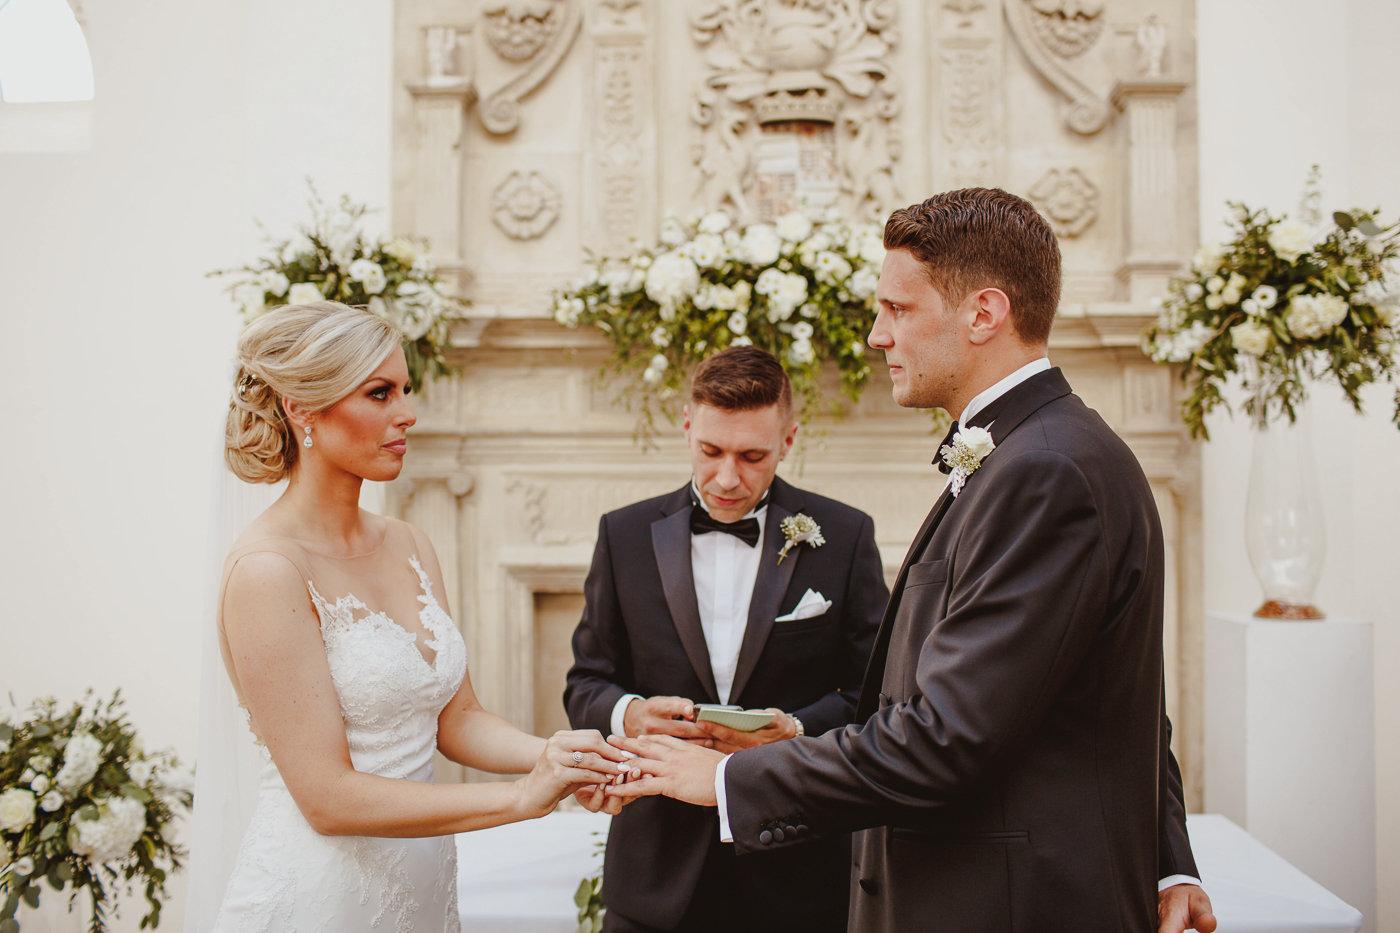 wrest-park-wedding-photography-12.jpg